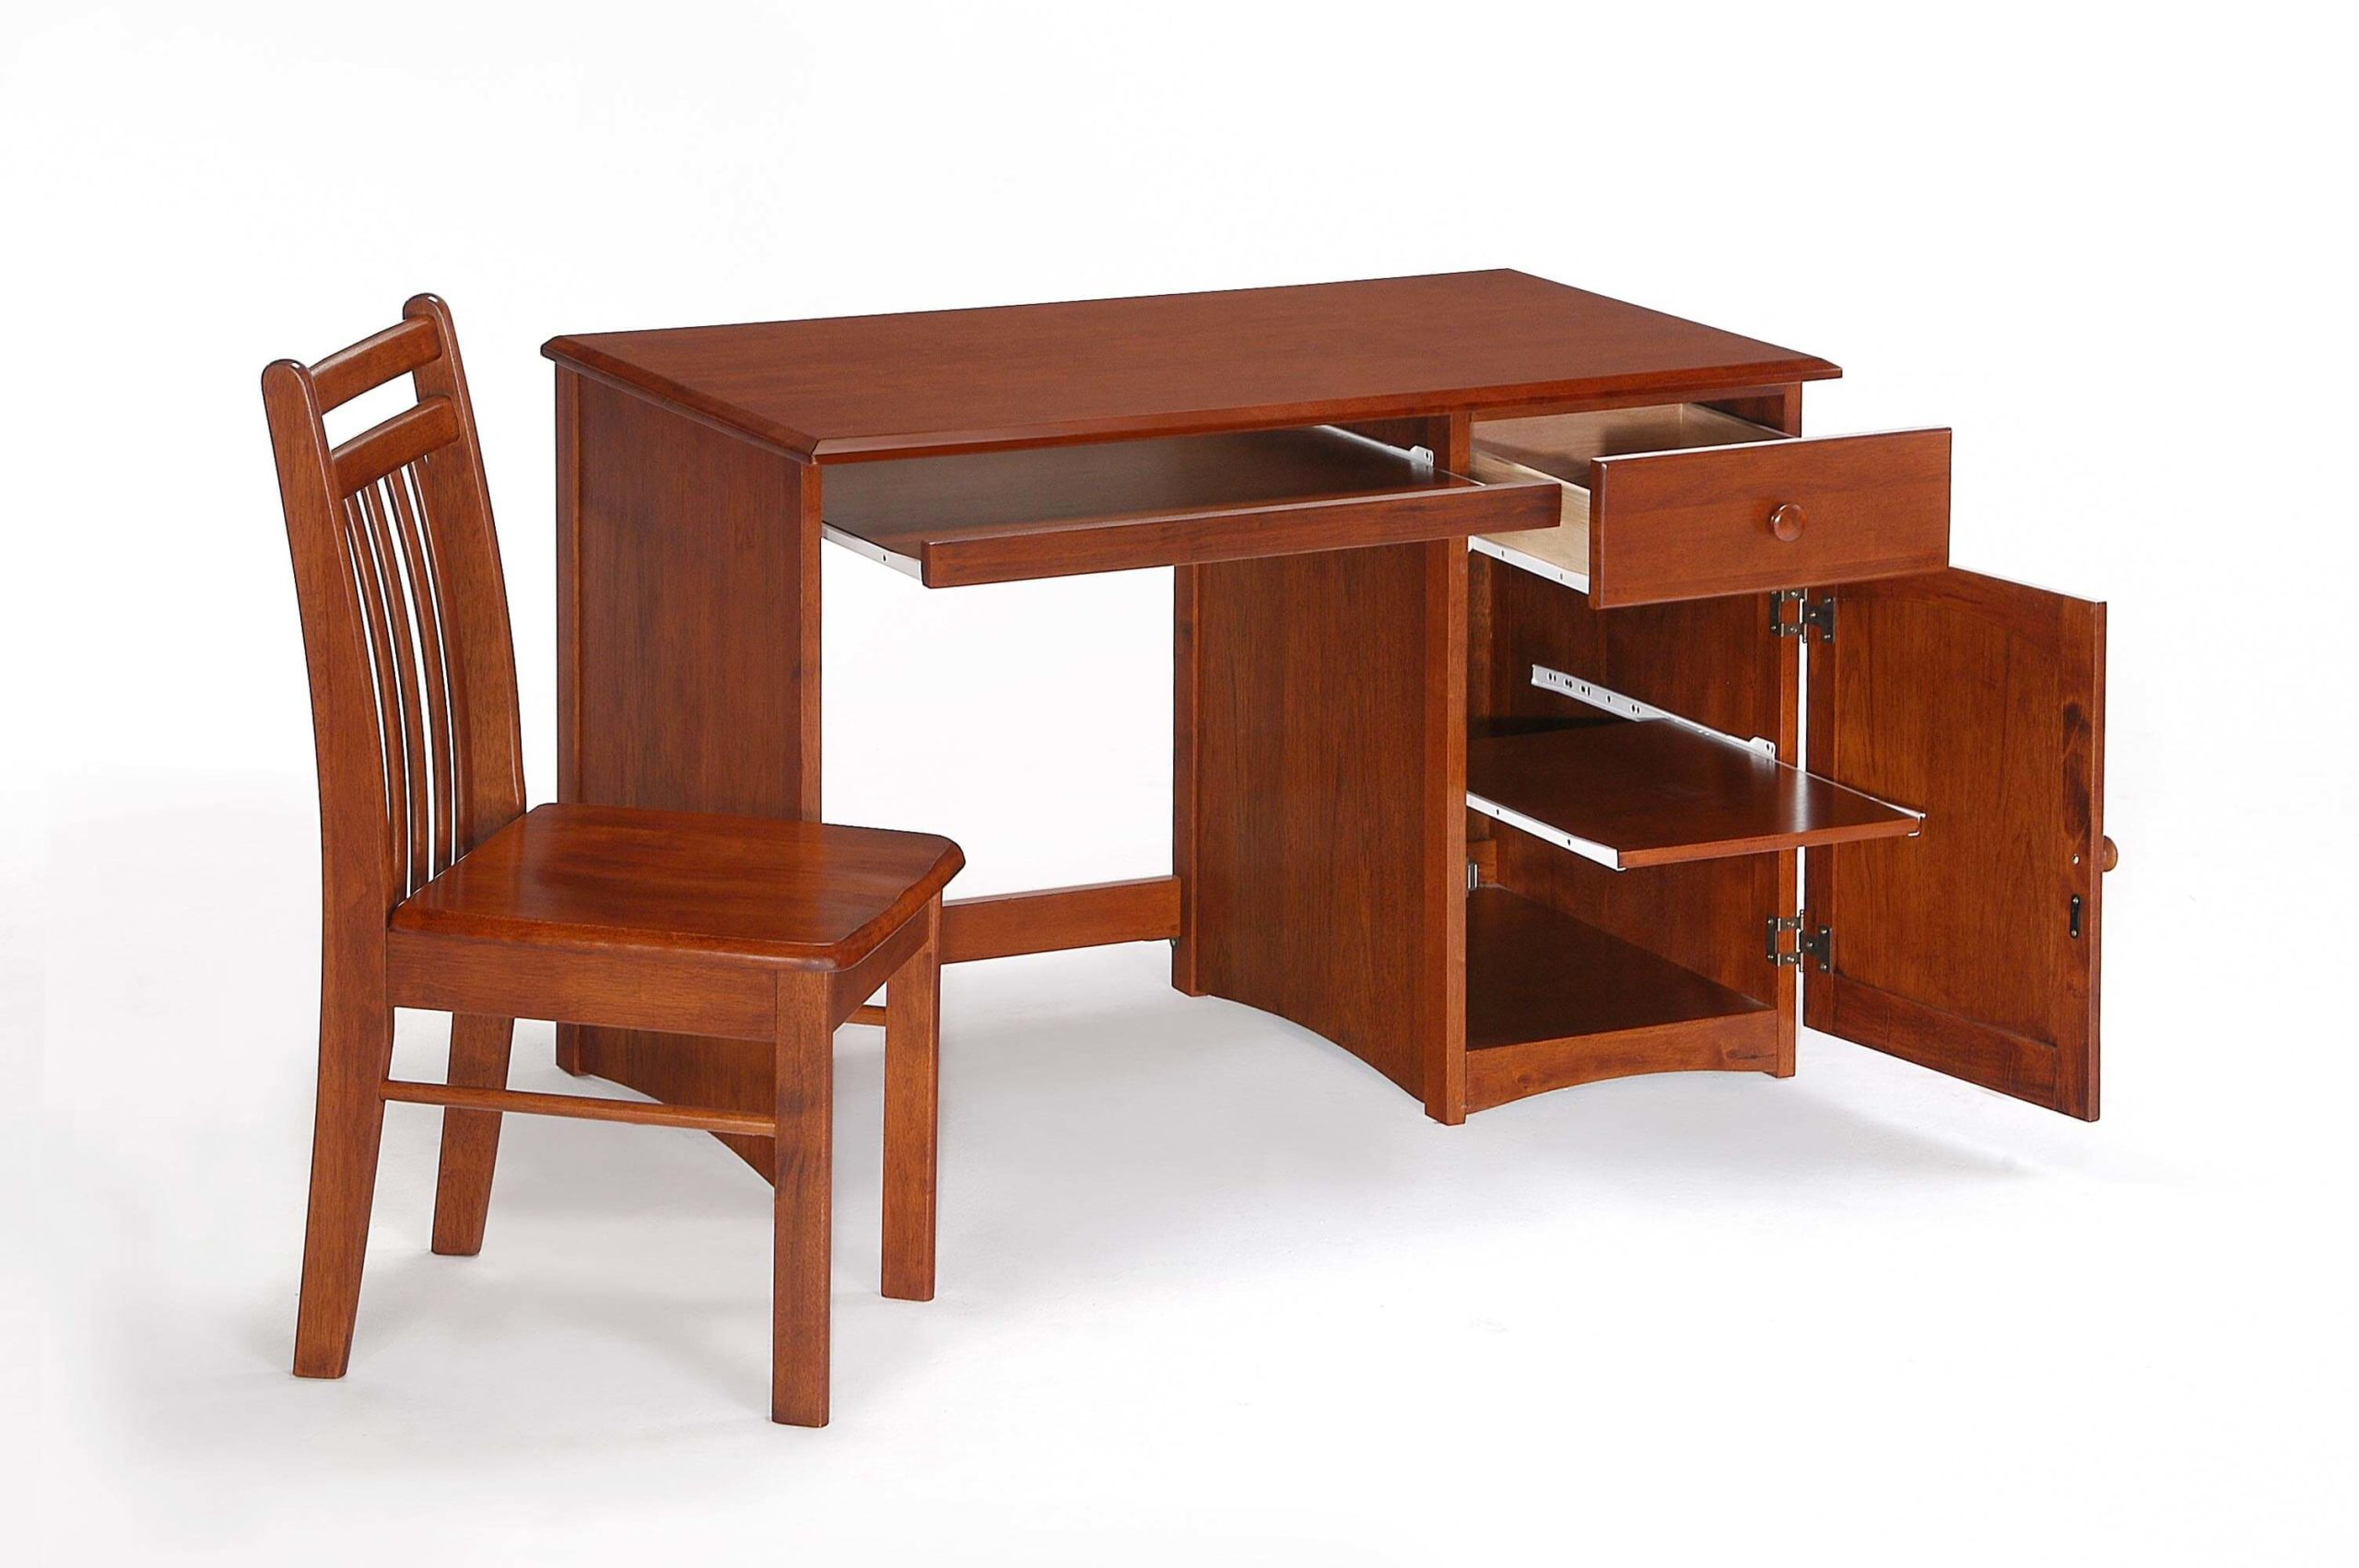 Clove Student Desk Chair